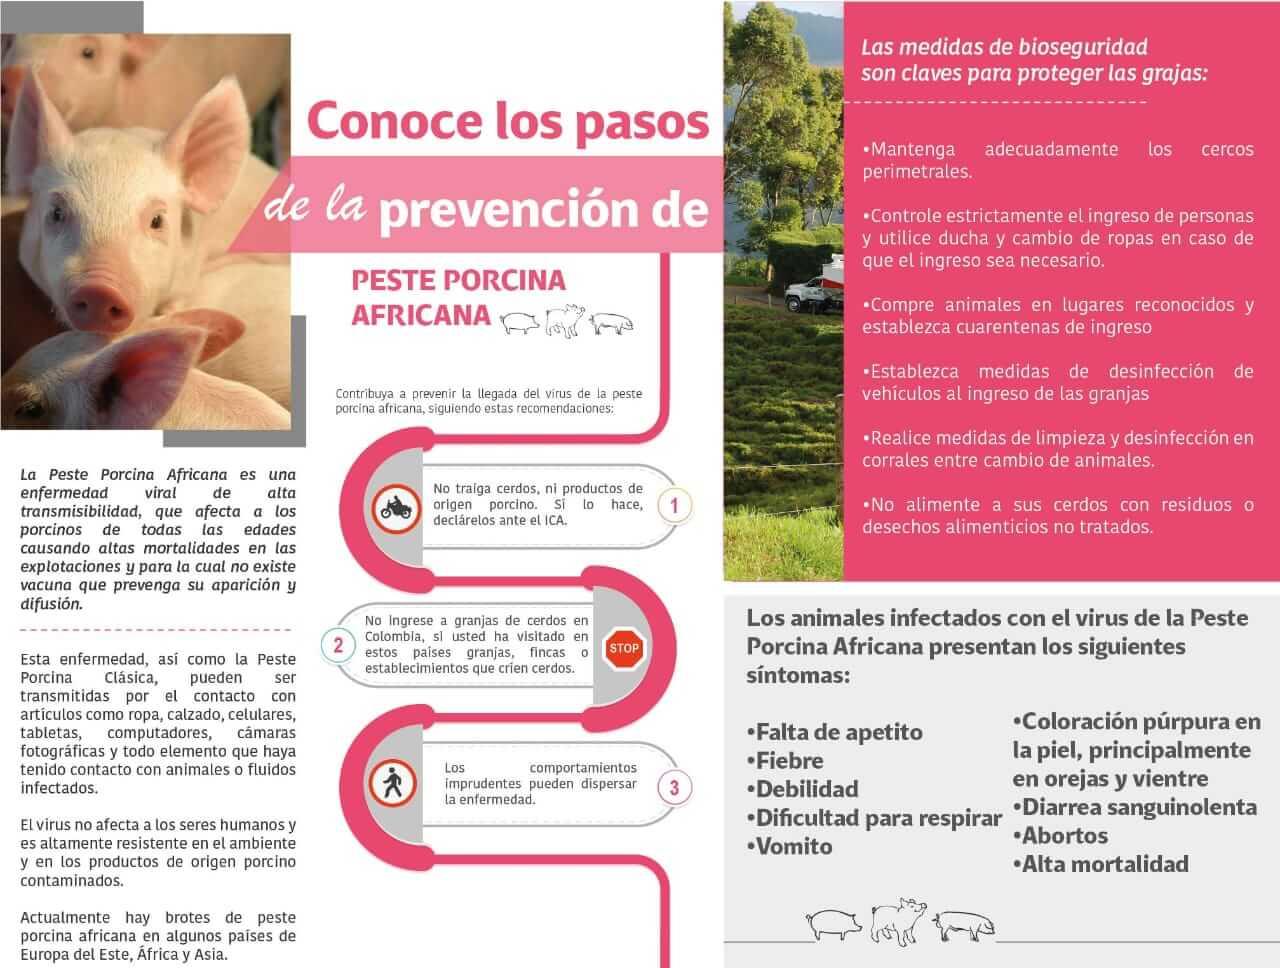 https://www.porkcolombia.co/wp-content/uploads/2019/05/IMG-20190523-WA0014.jpg